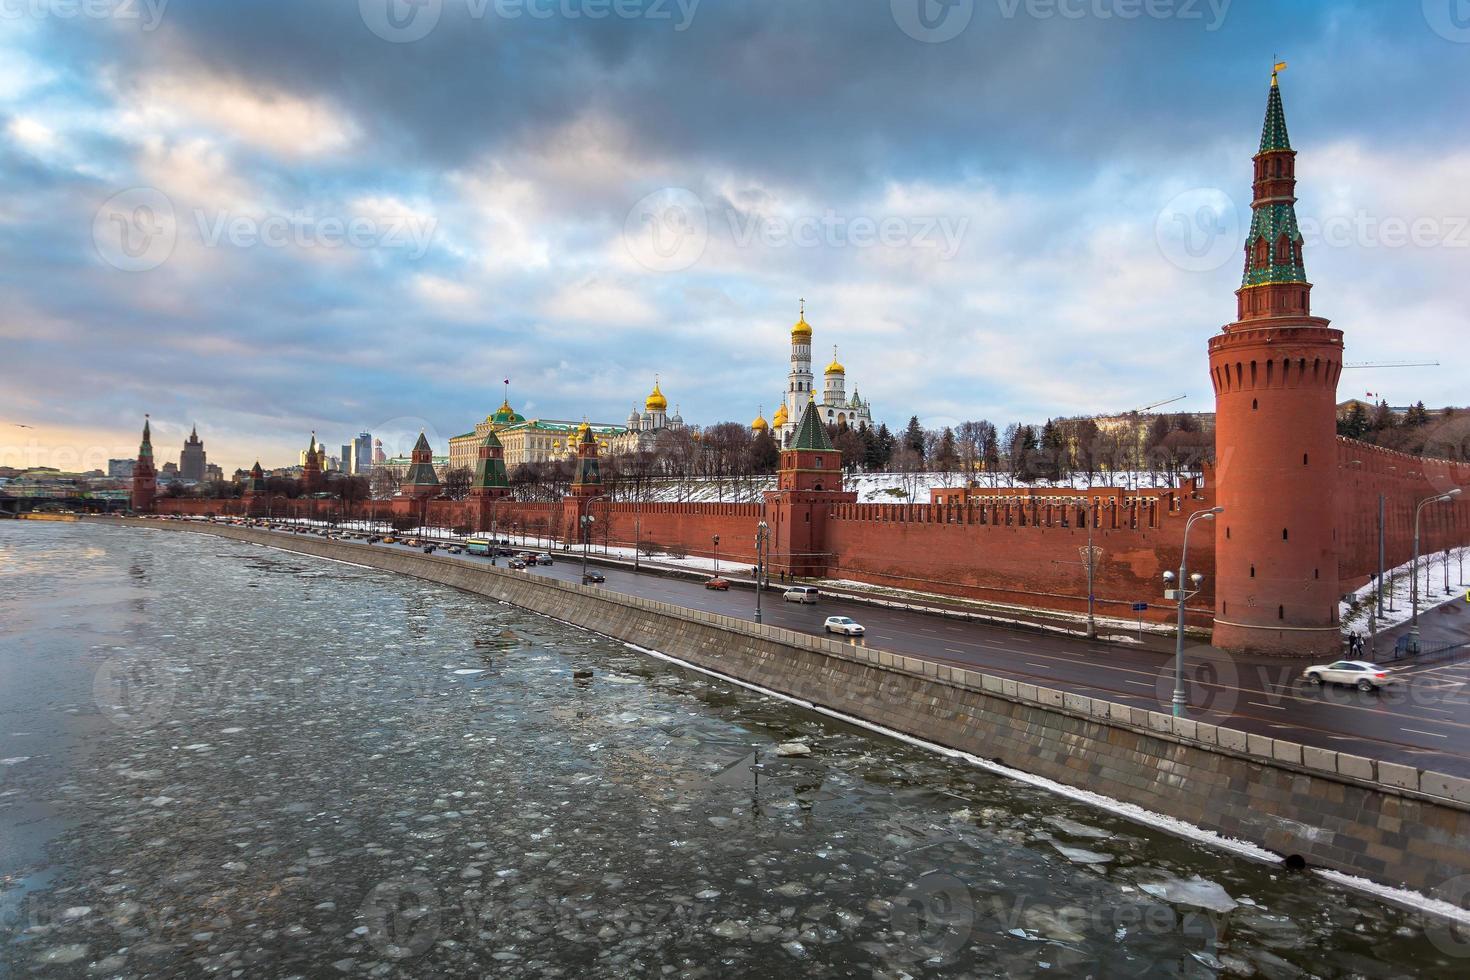 Moscow river and Kremlin embankment at winter photo